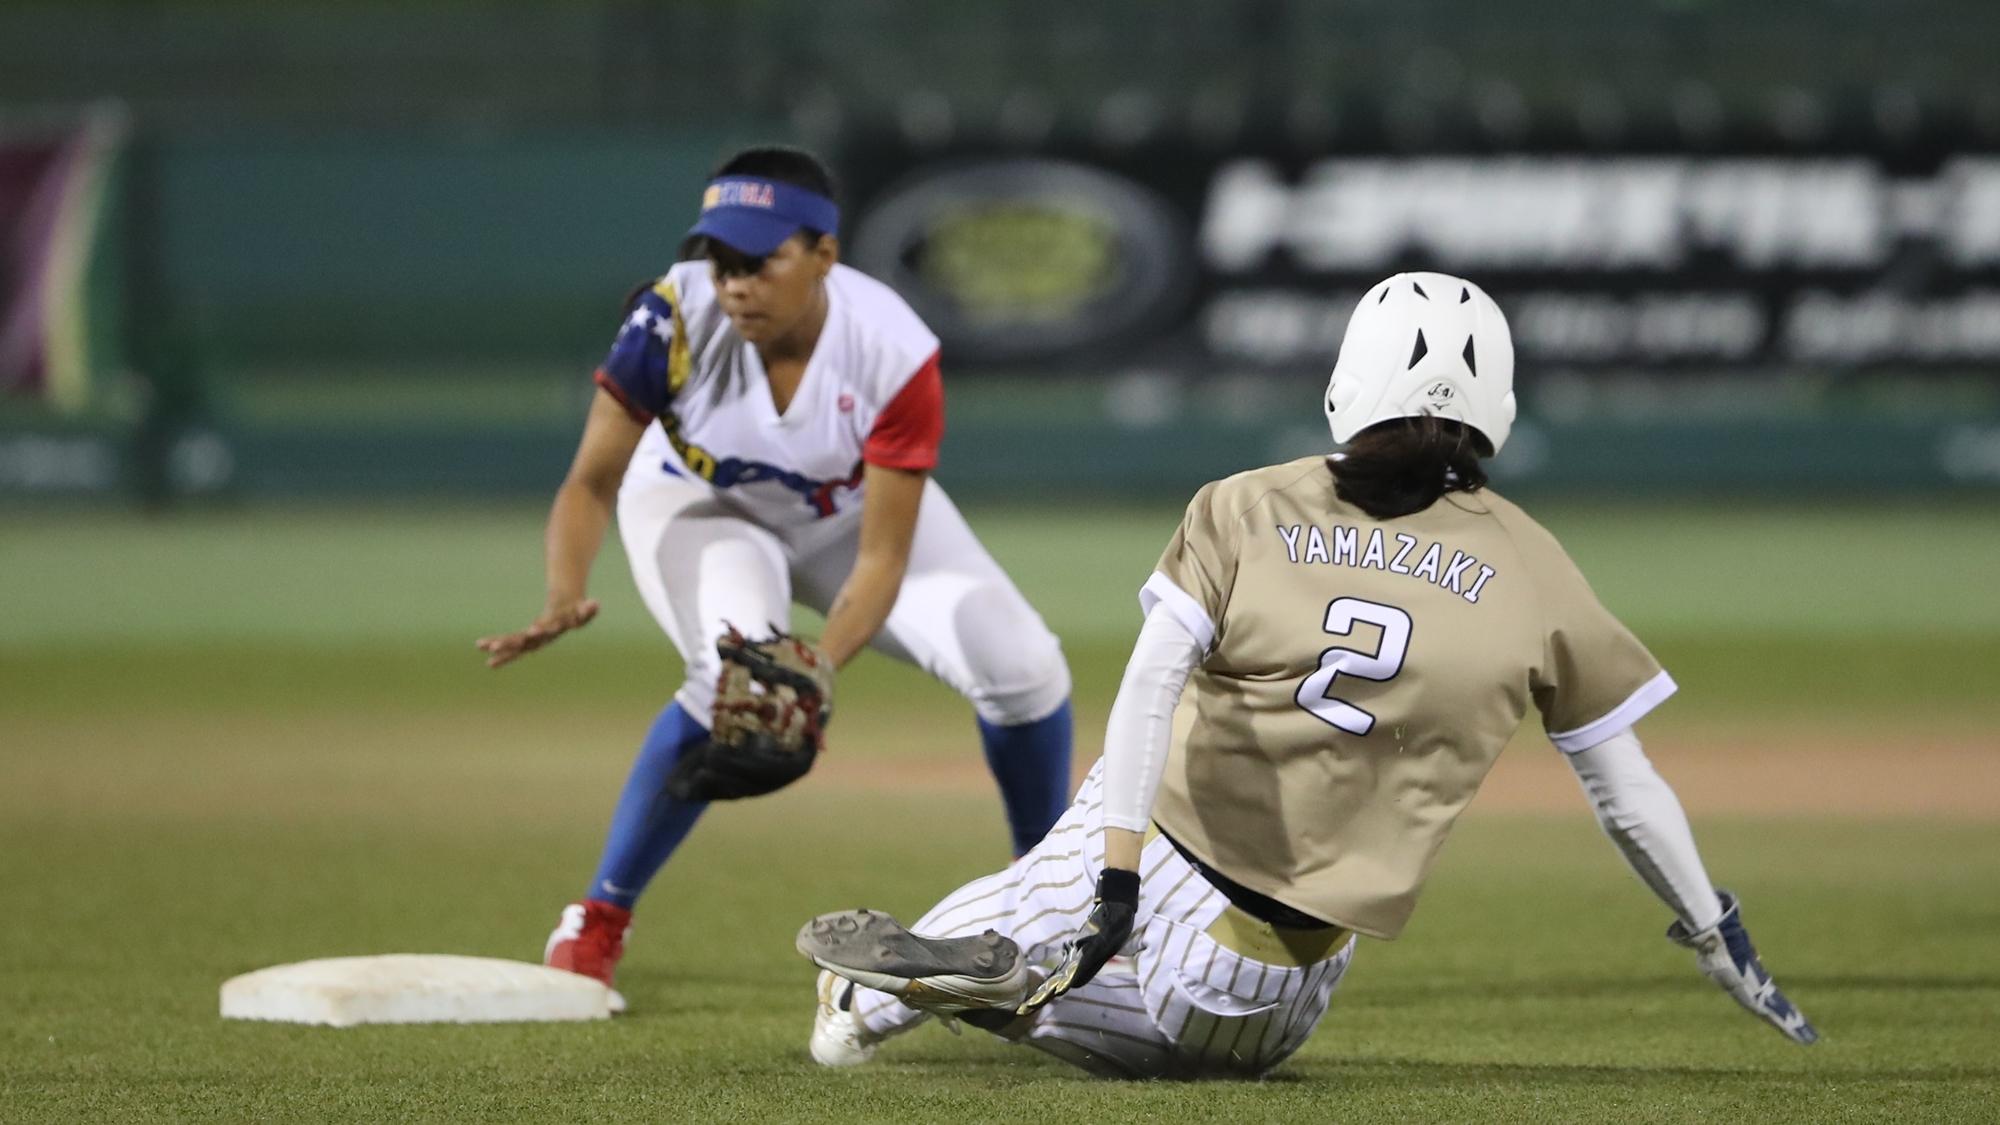 Saki Yamazaki of Japan tries to avoid a tag from Estefany Duno of Venezuela